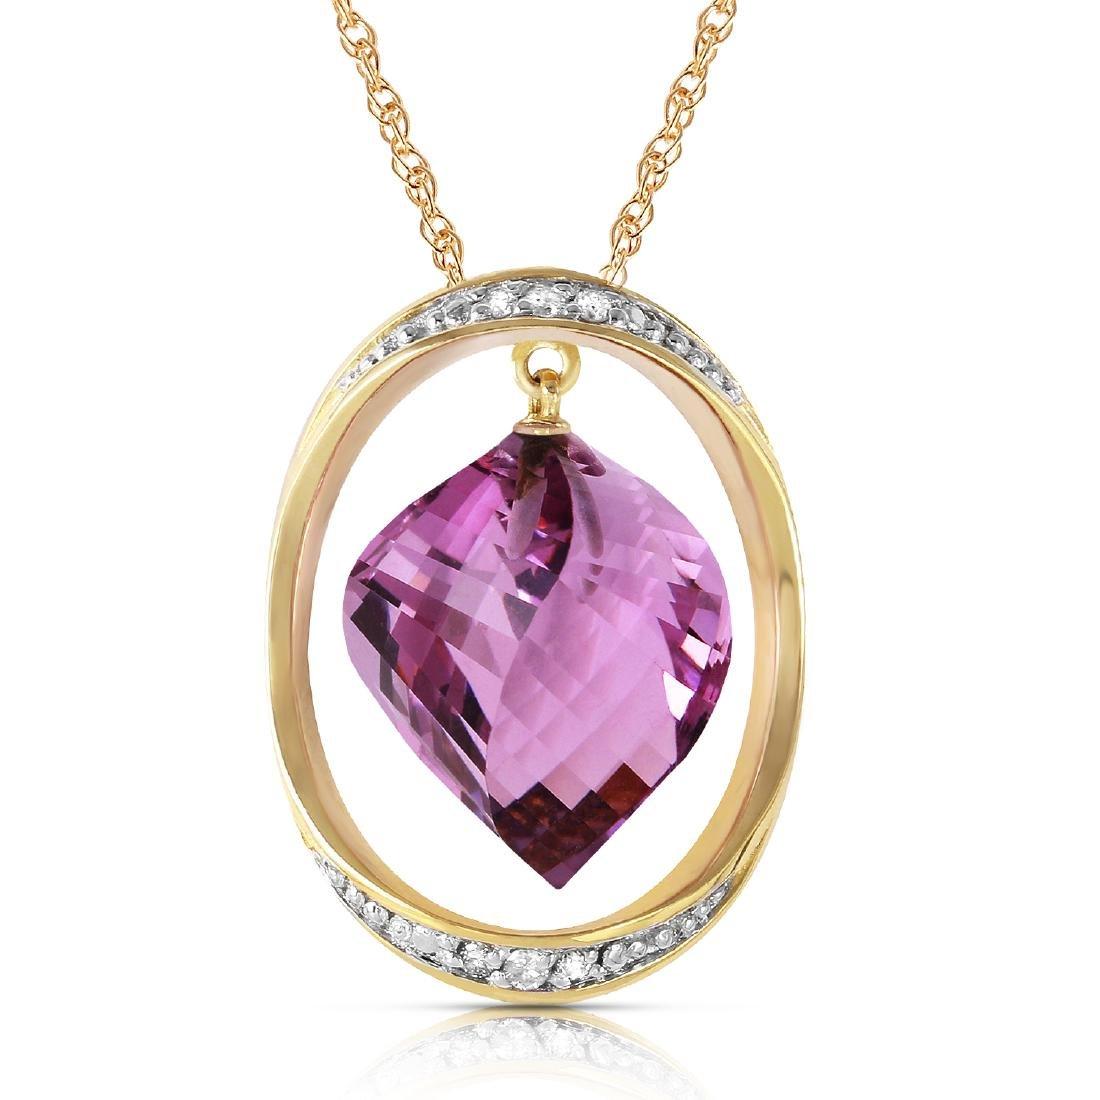 Genuine 10.85 ctw Amethyst & Diamond Necklace Jewelry